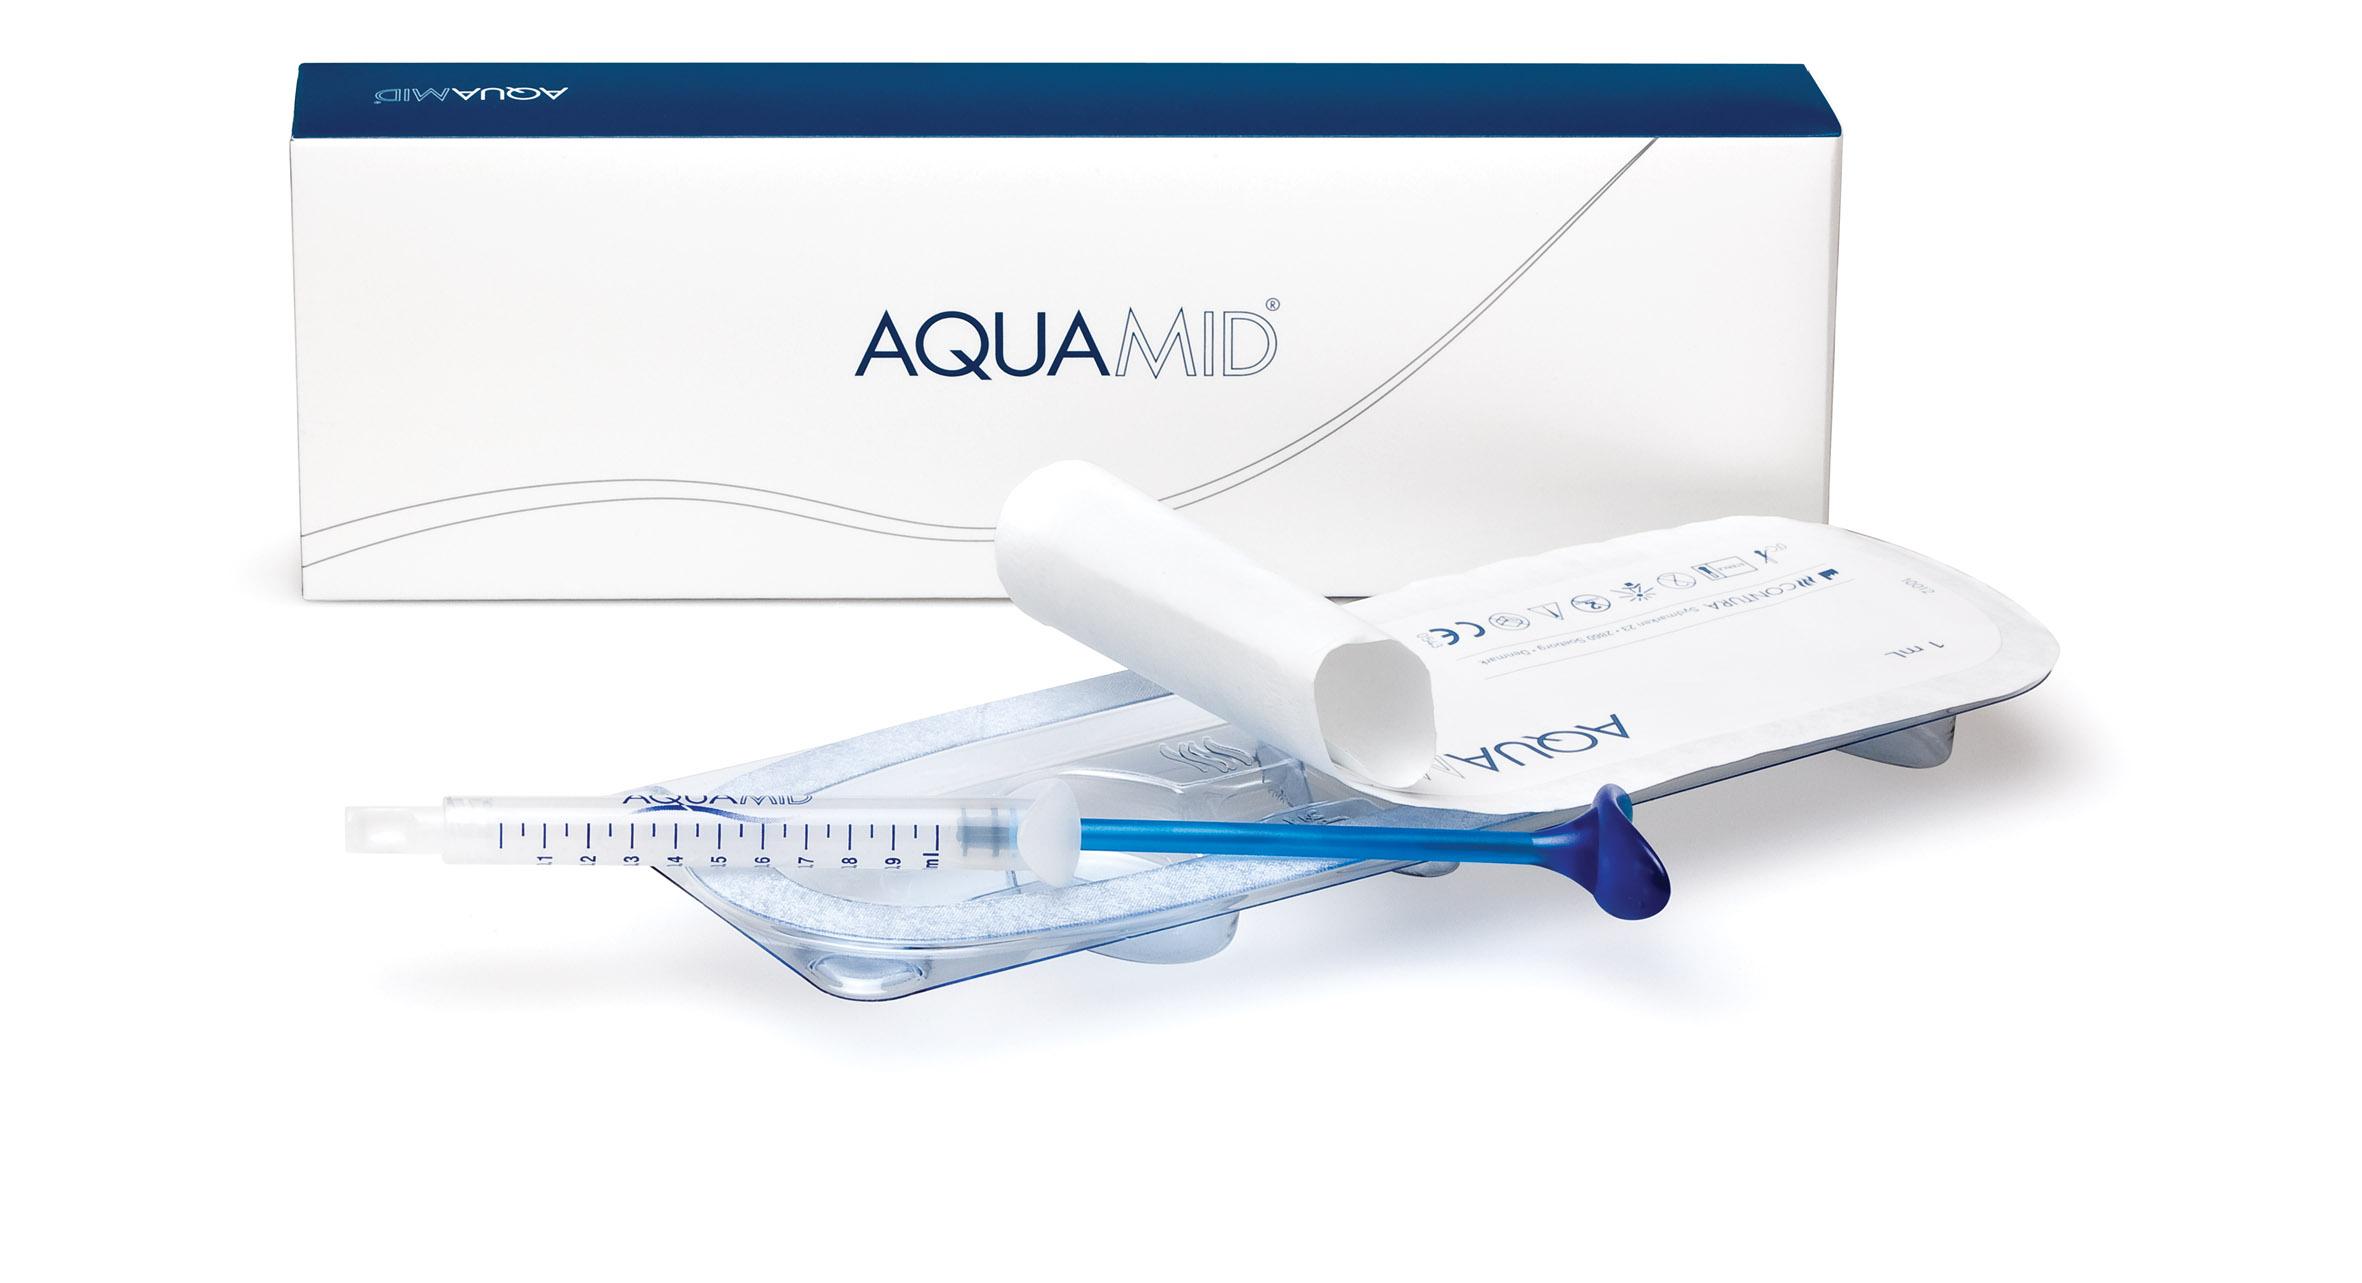 sửa mũi bằng aquamid